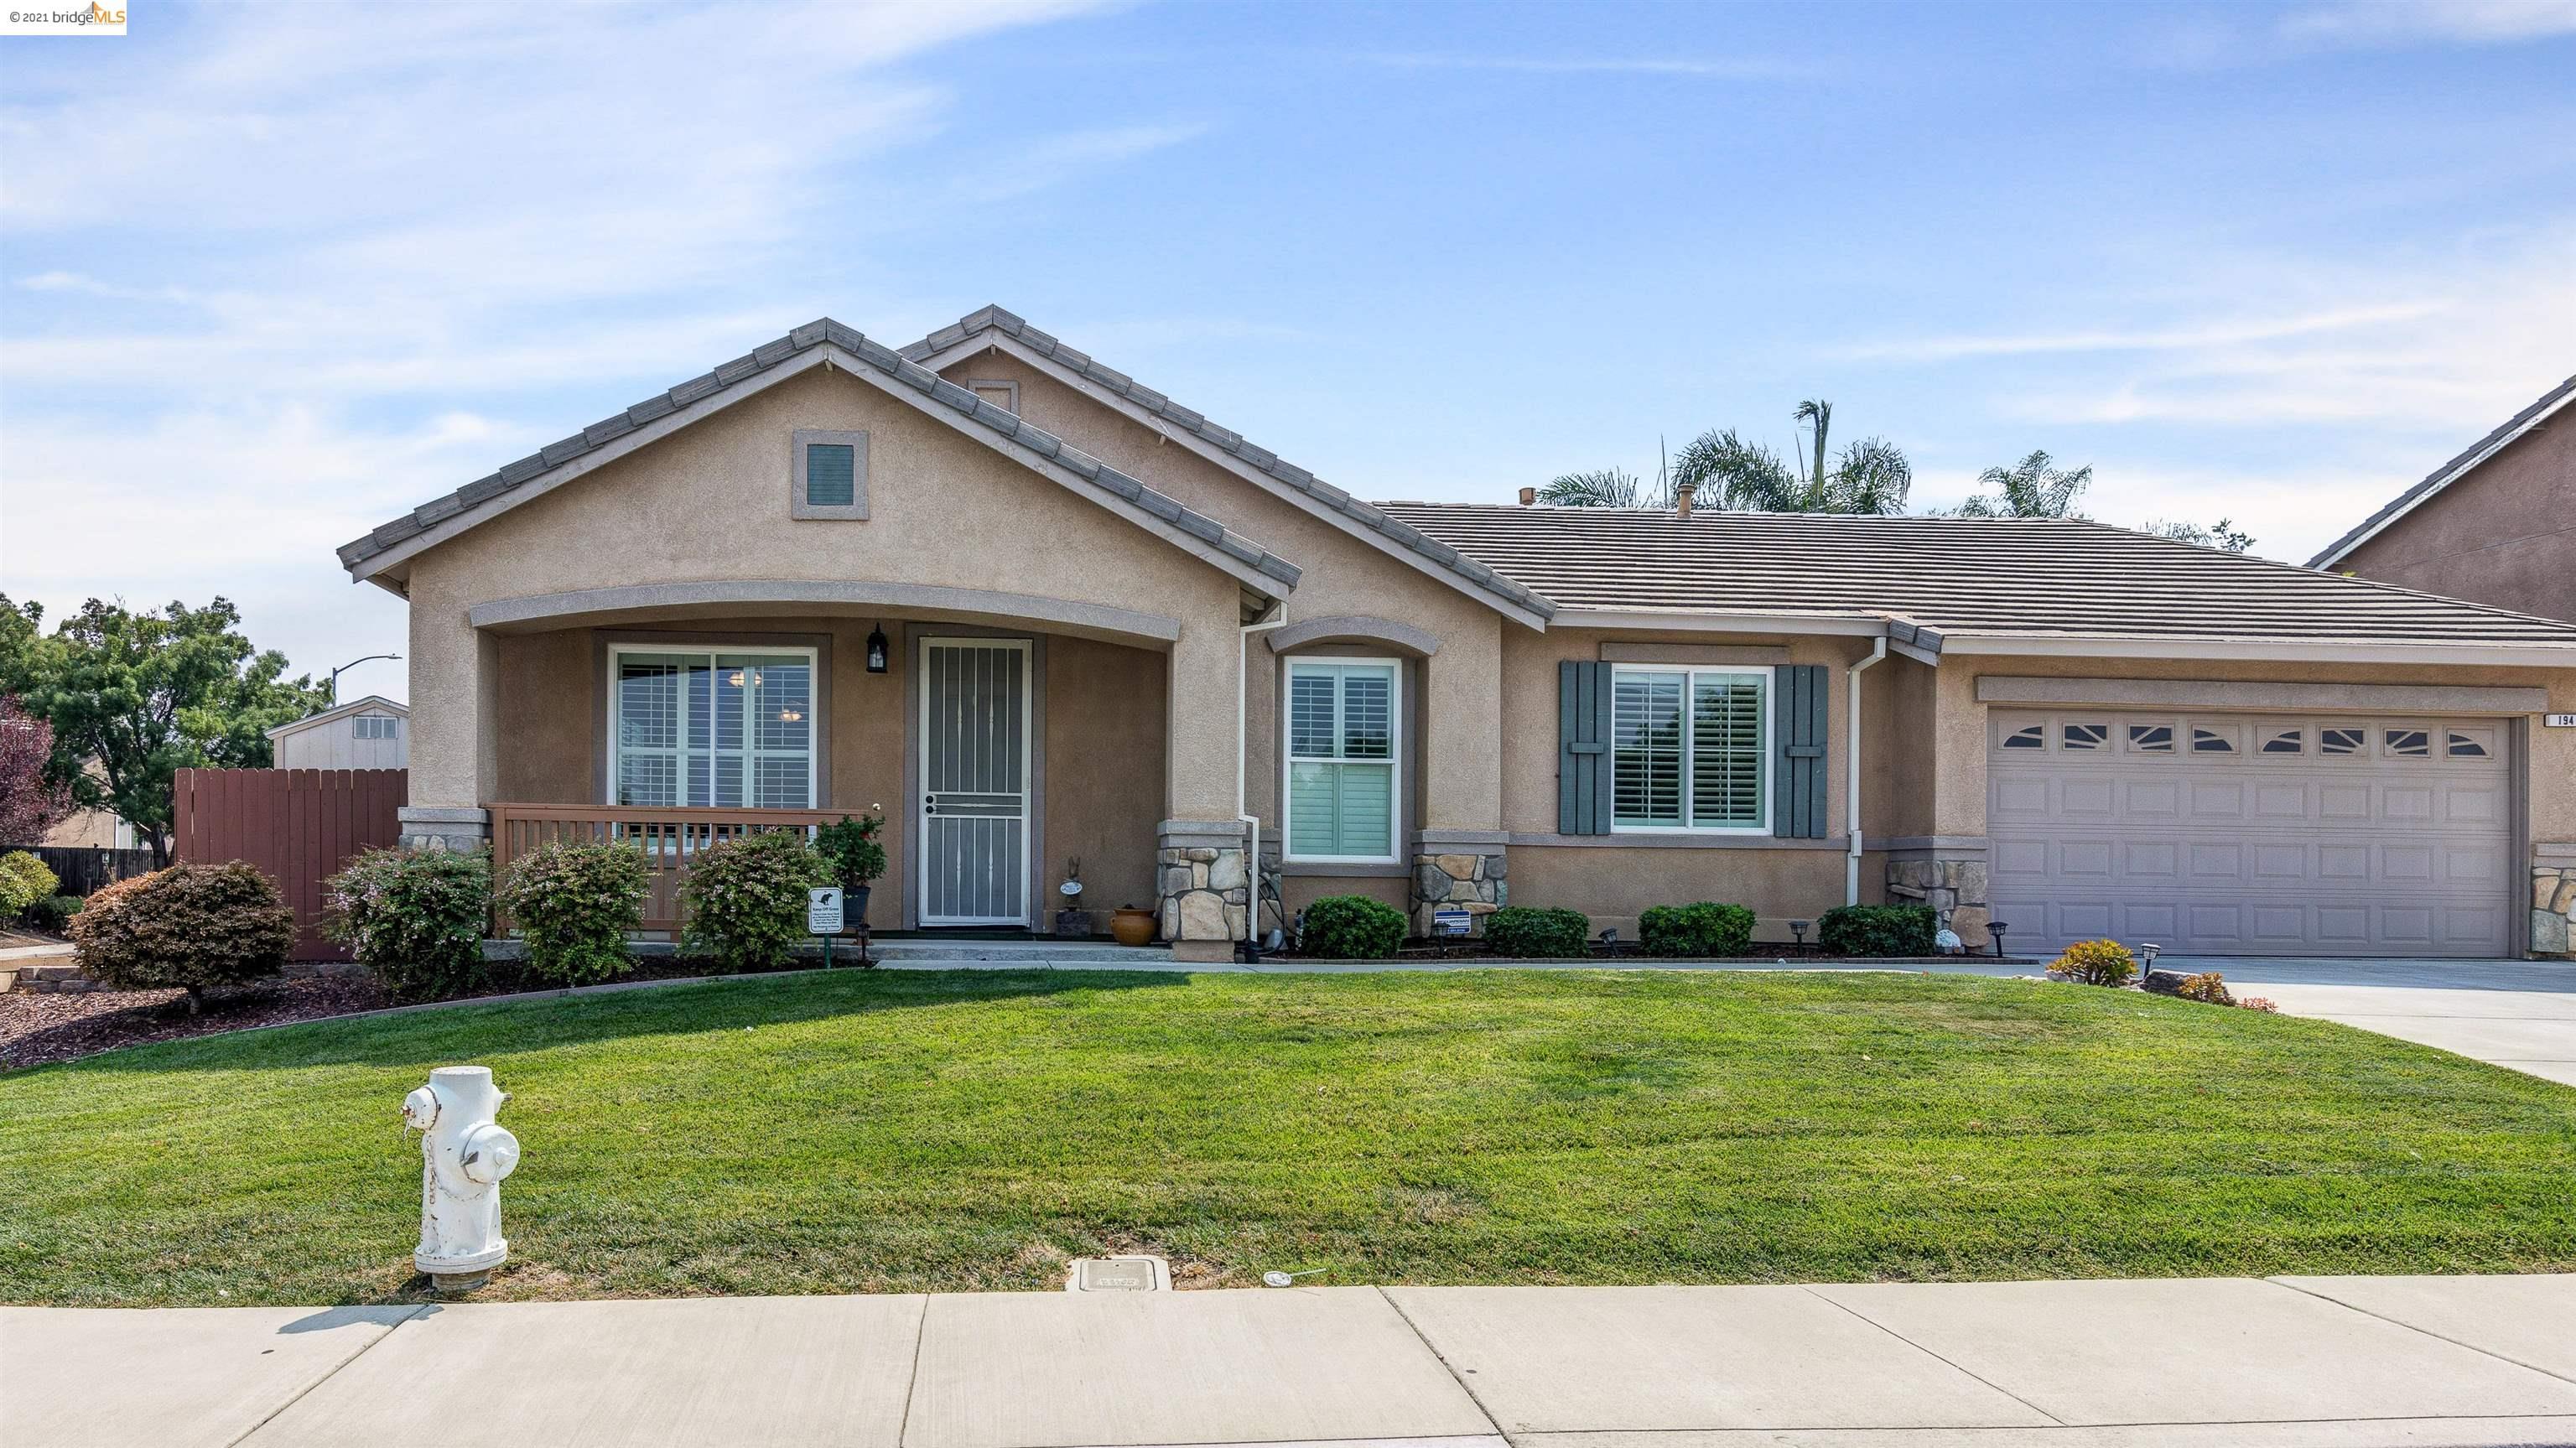 194 Rangewood Dr, PITTSBURG, CA 94565